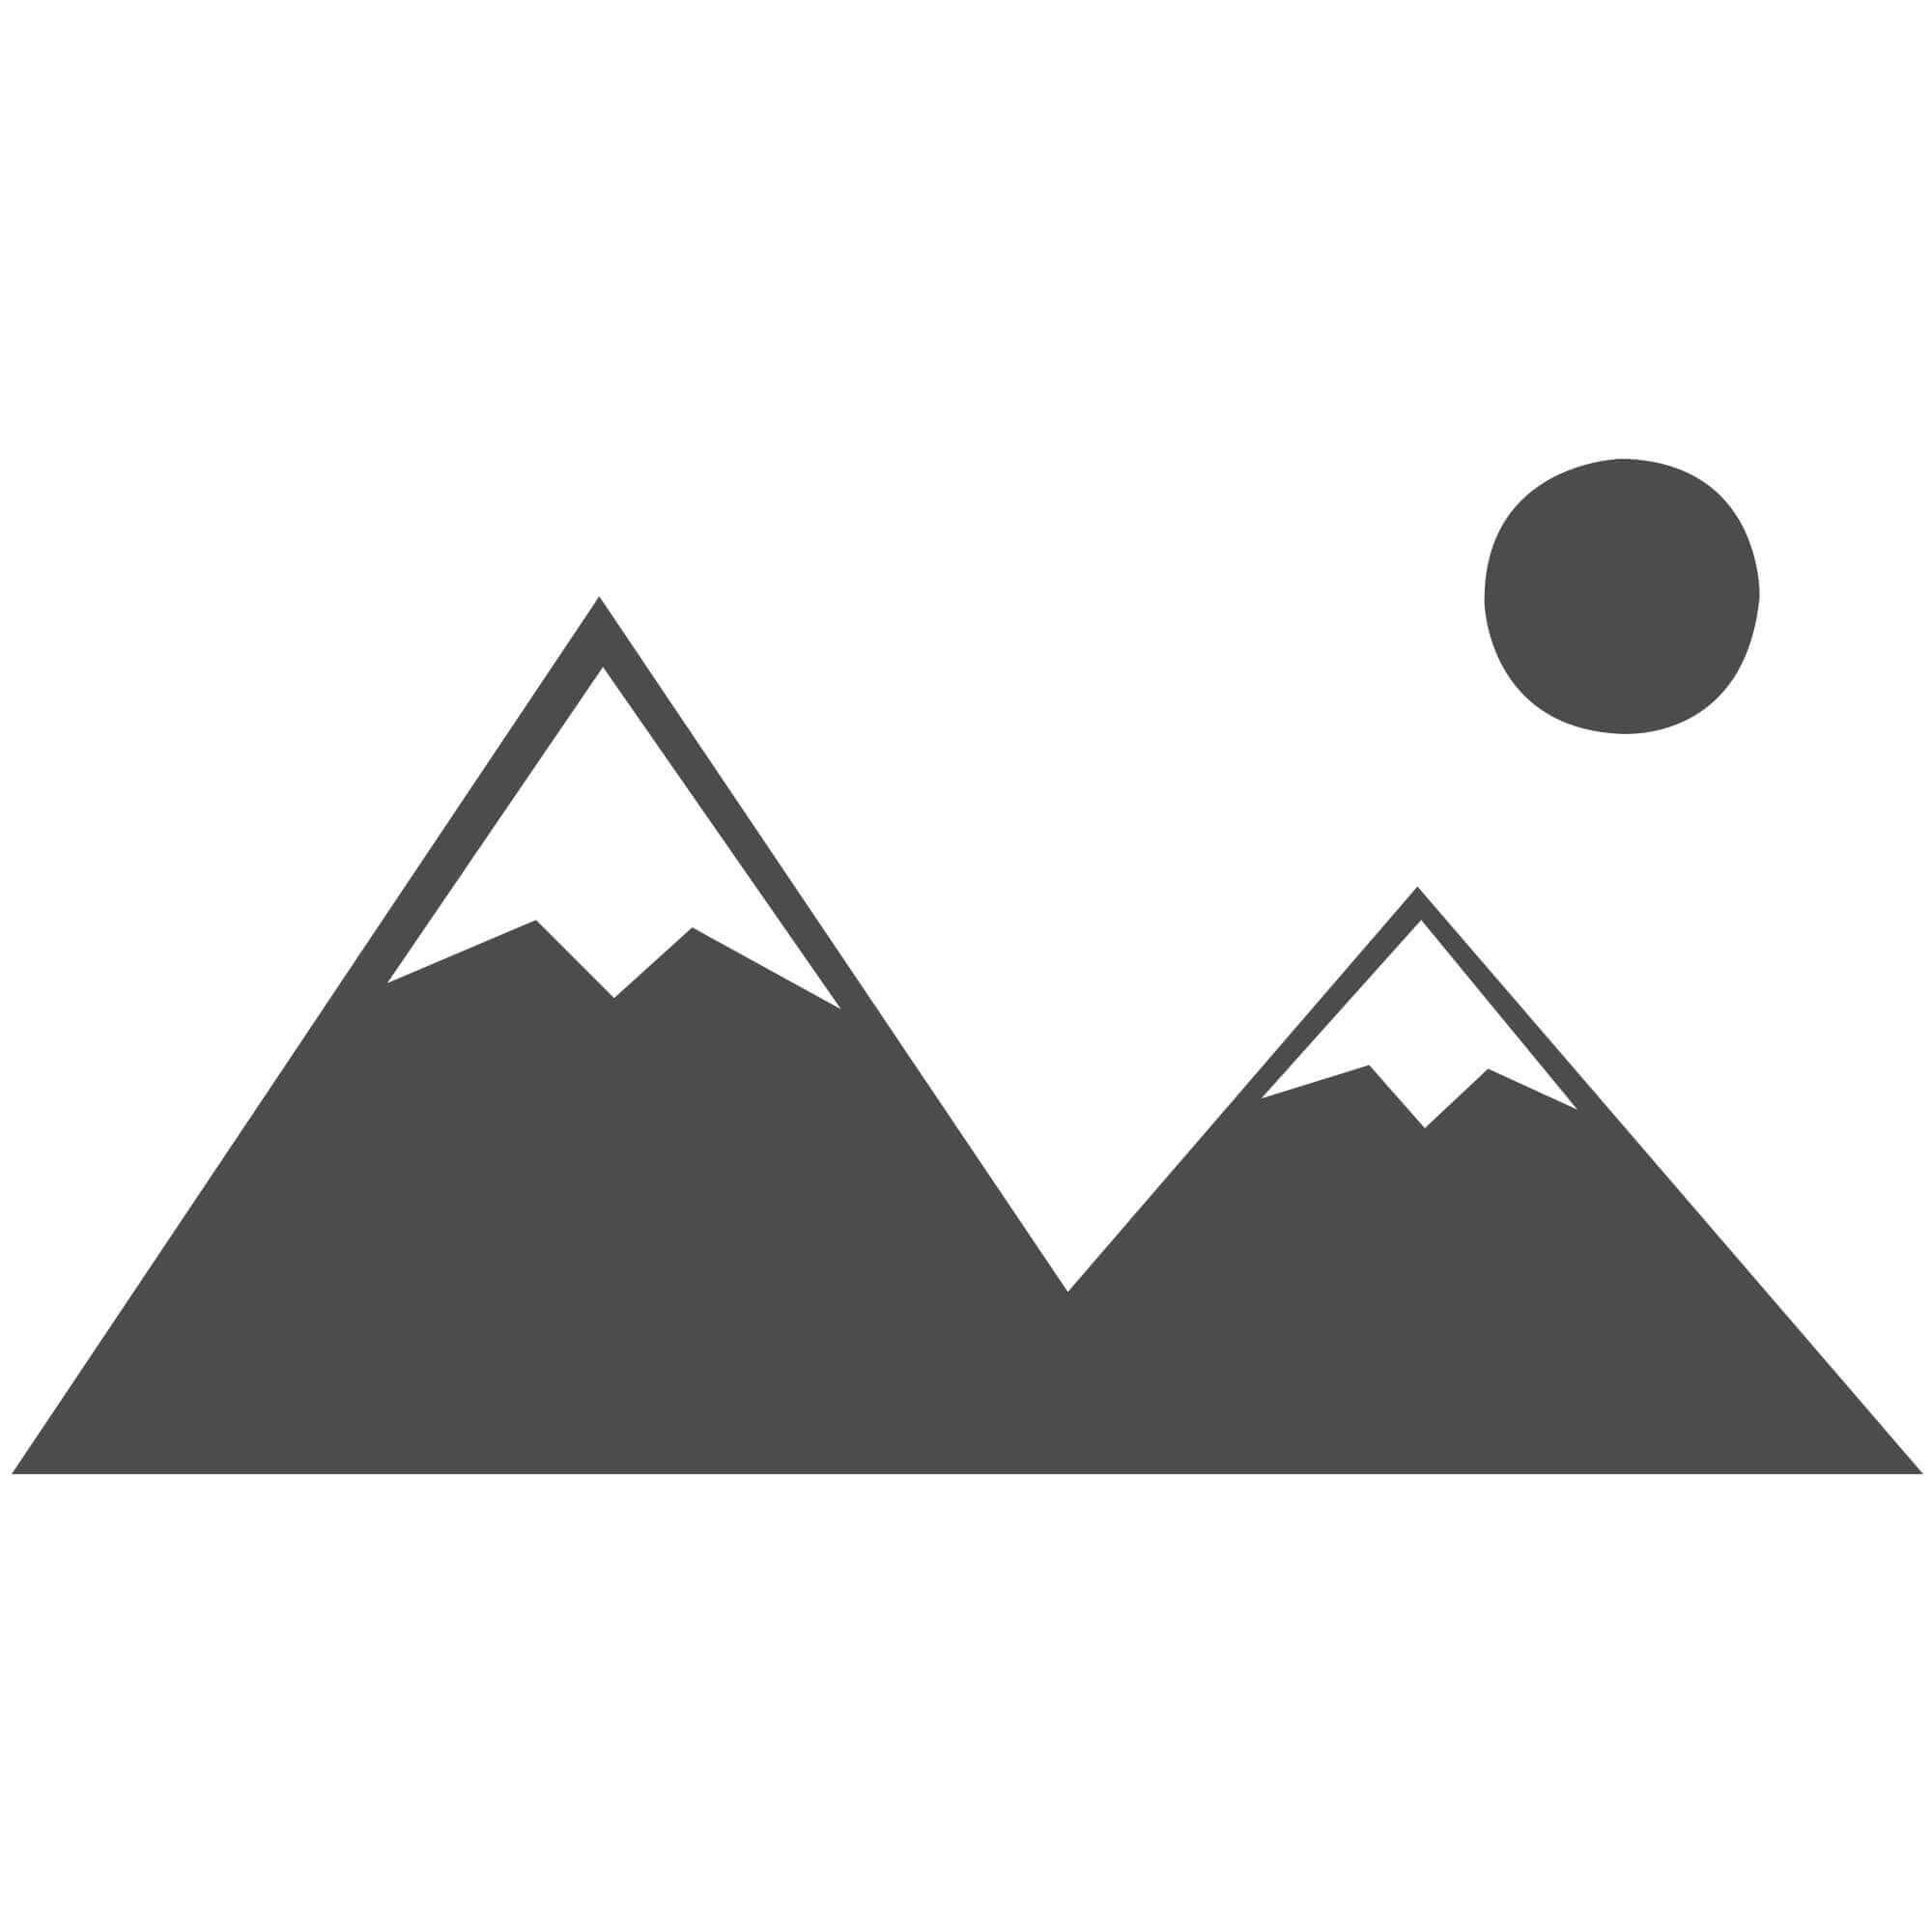 "Galleria Rug - Stripe Multi 79164 4848 - Size 160 x 230 cm (5'3"" x 7'7"")"